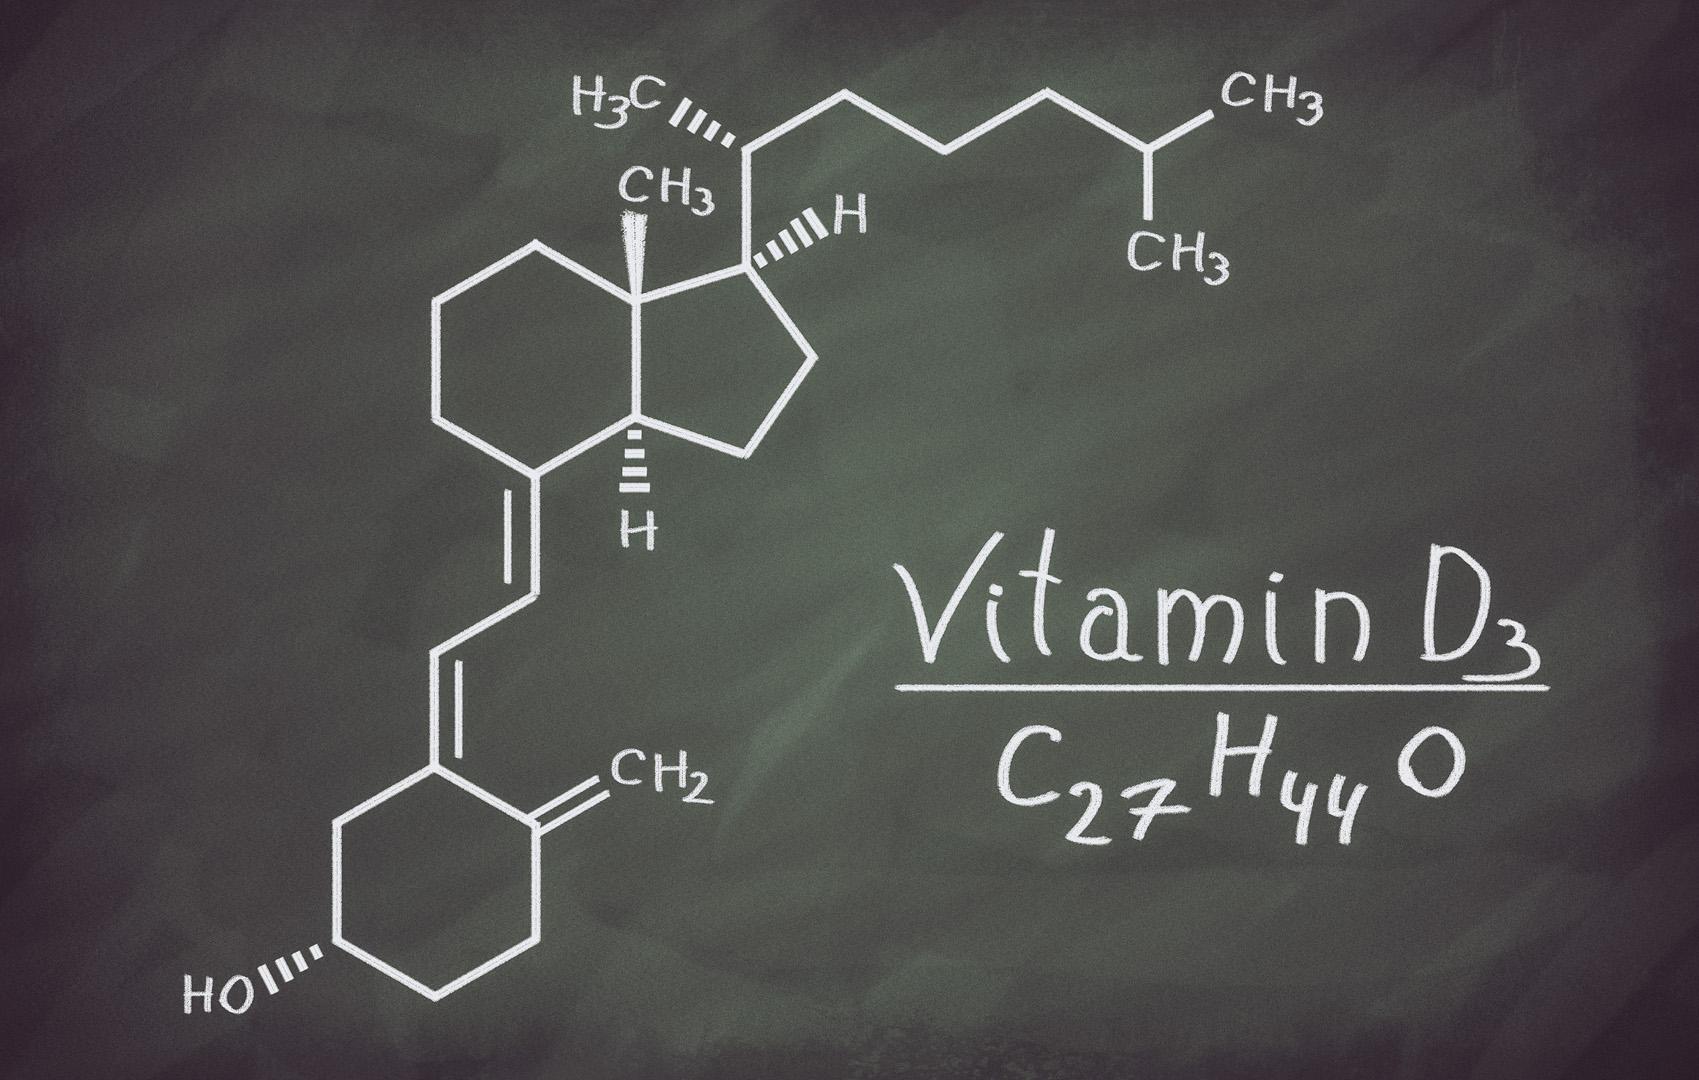 Vitamin D3 (Cholecalciferol)